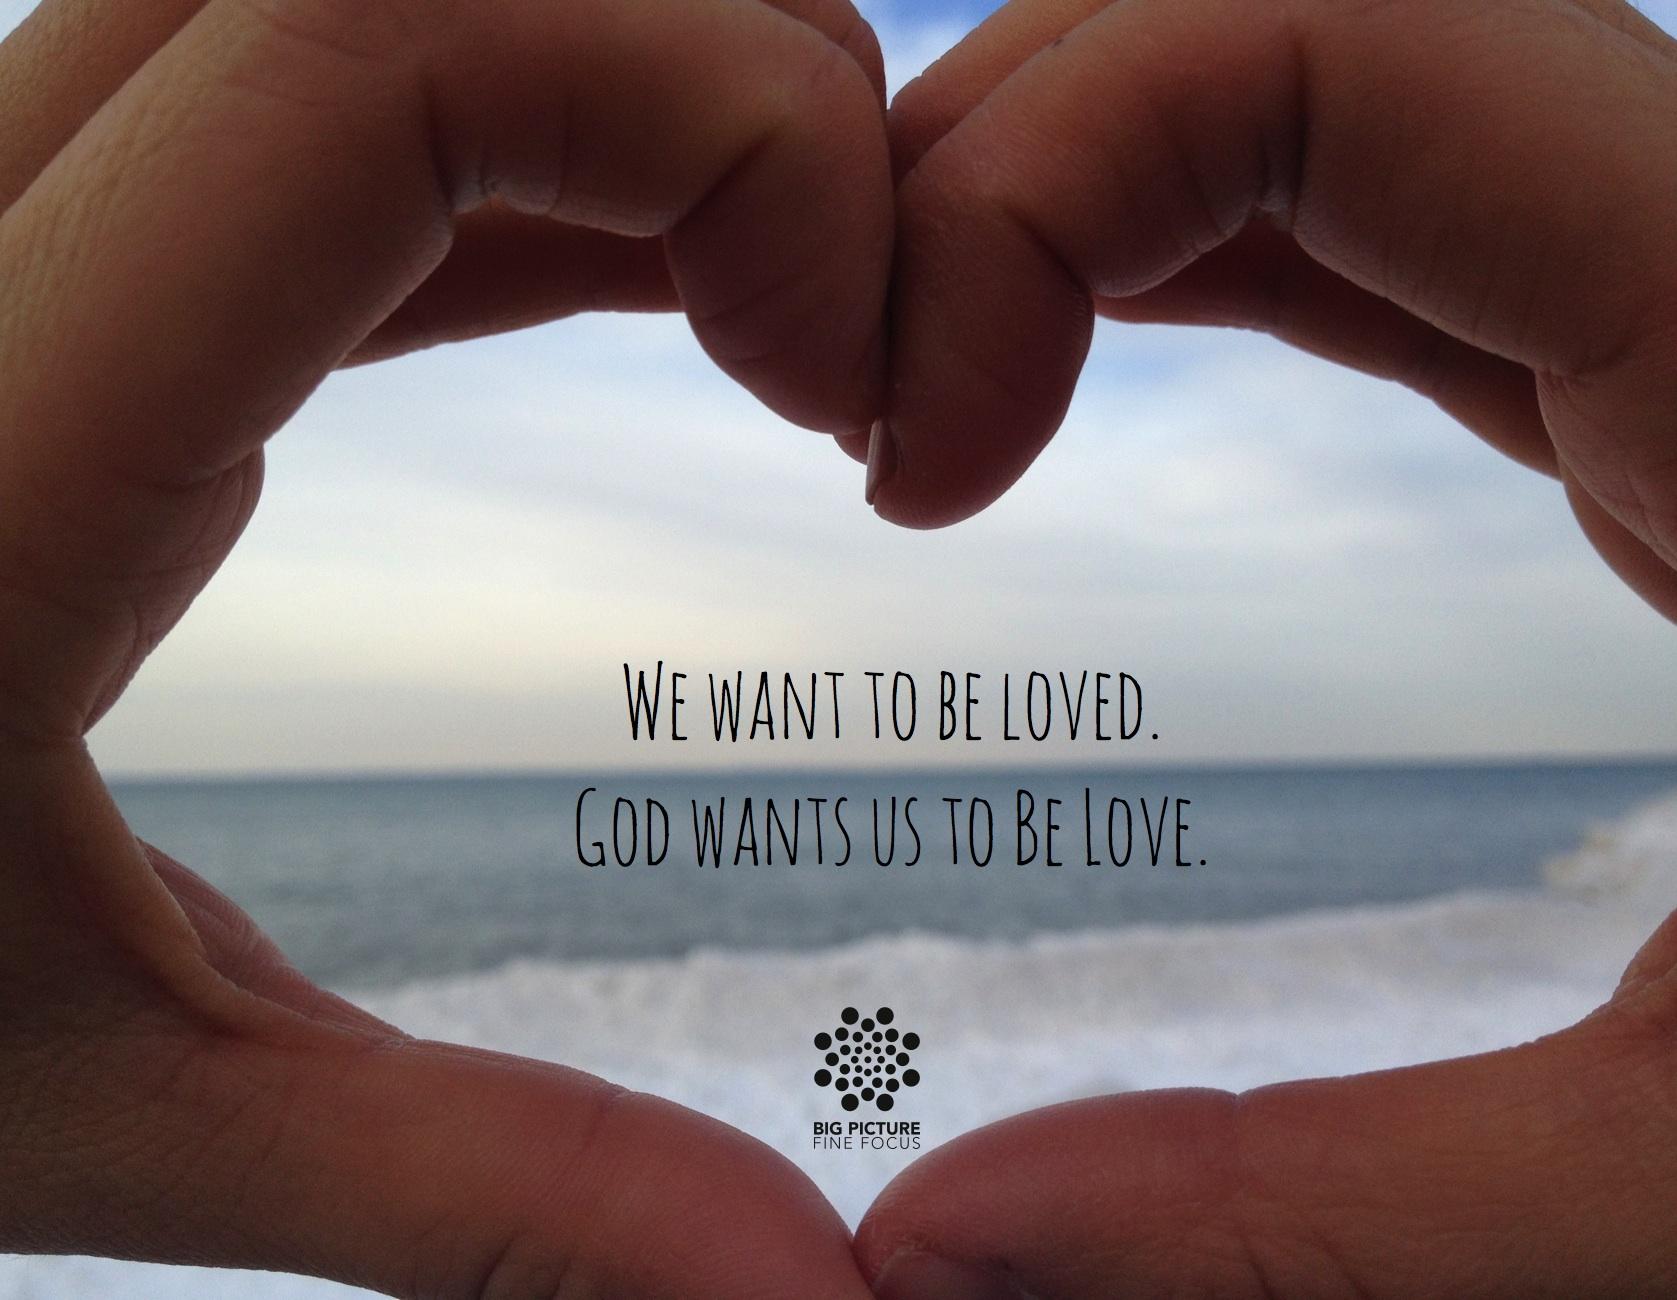 Be Love(d).